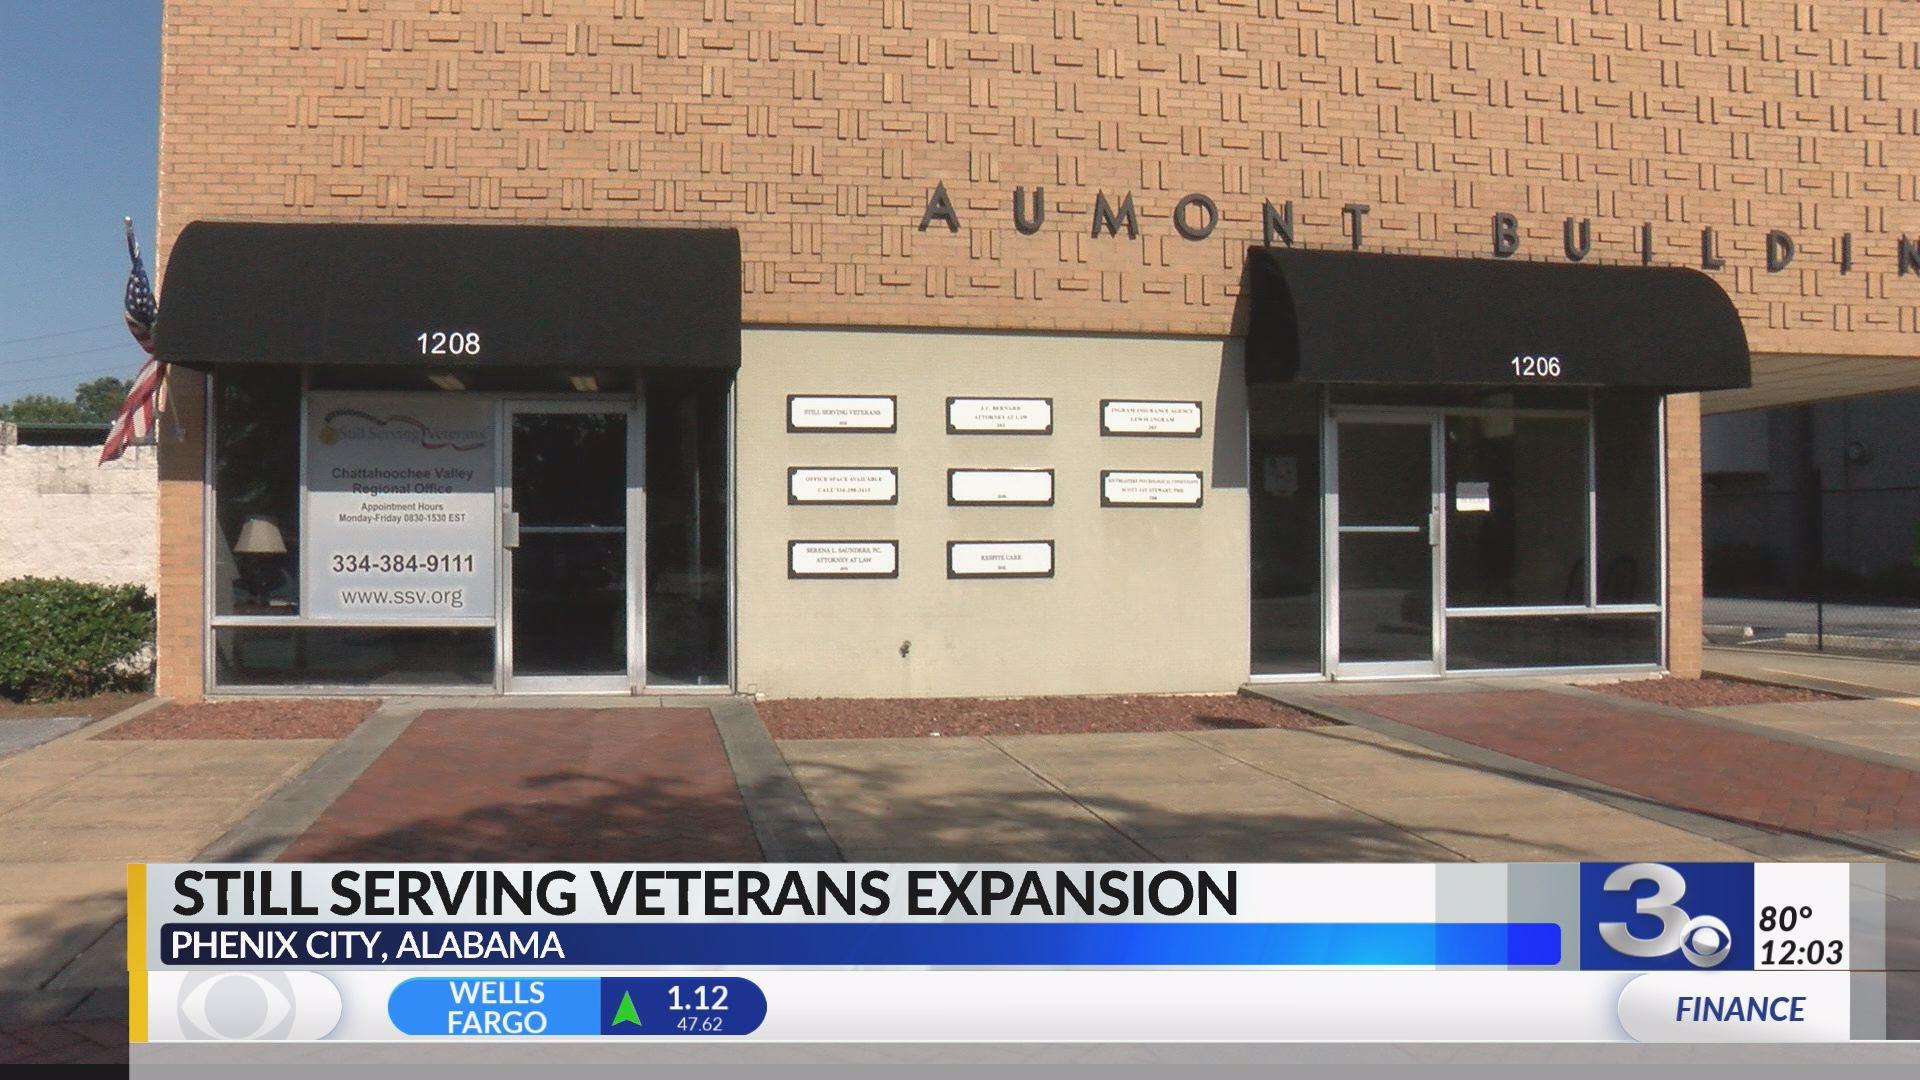 Still Serving Veterans celebrates Phenix City office